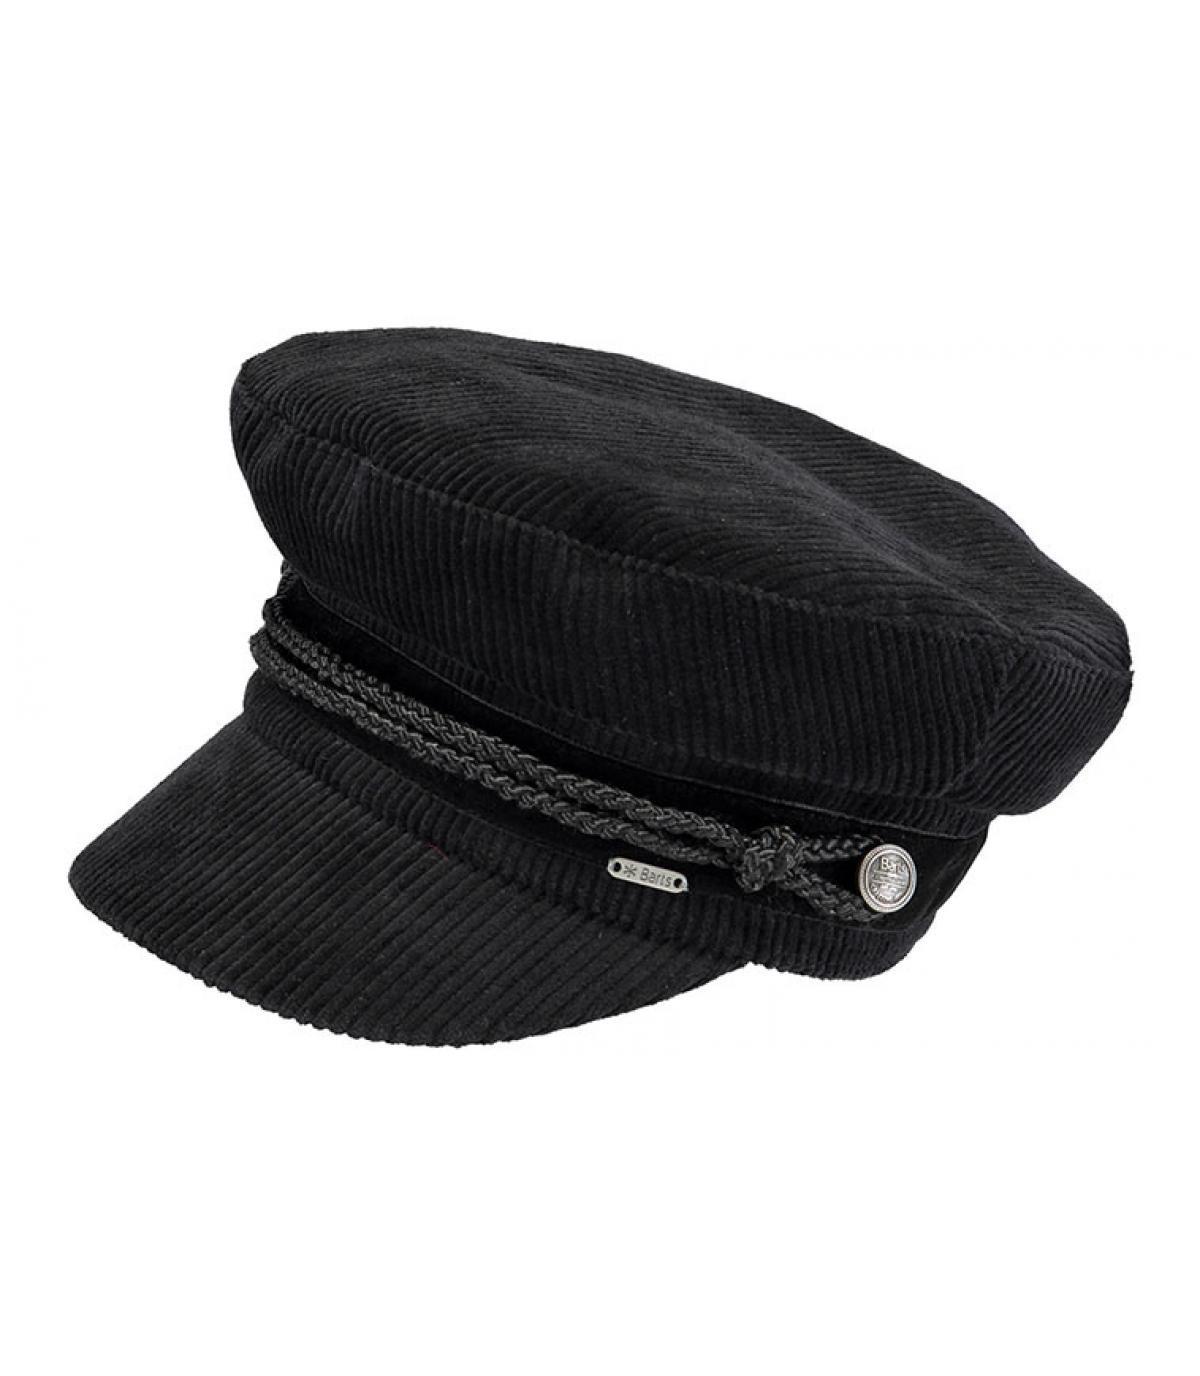 zwarte zeemanpet Barts - Odessa Cap black van Barts. Headict 4d1e072b9cdd